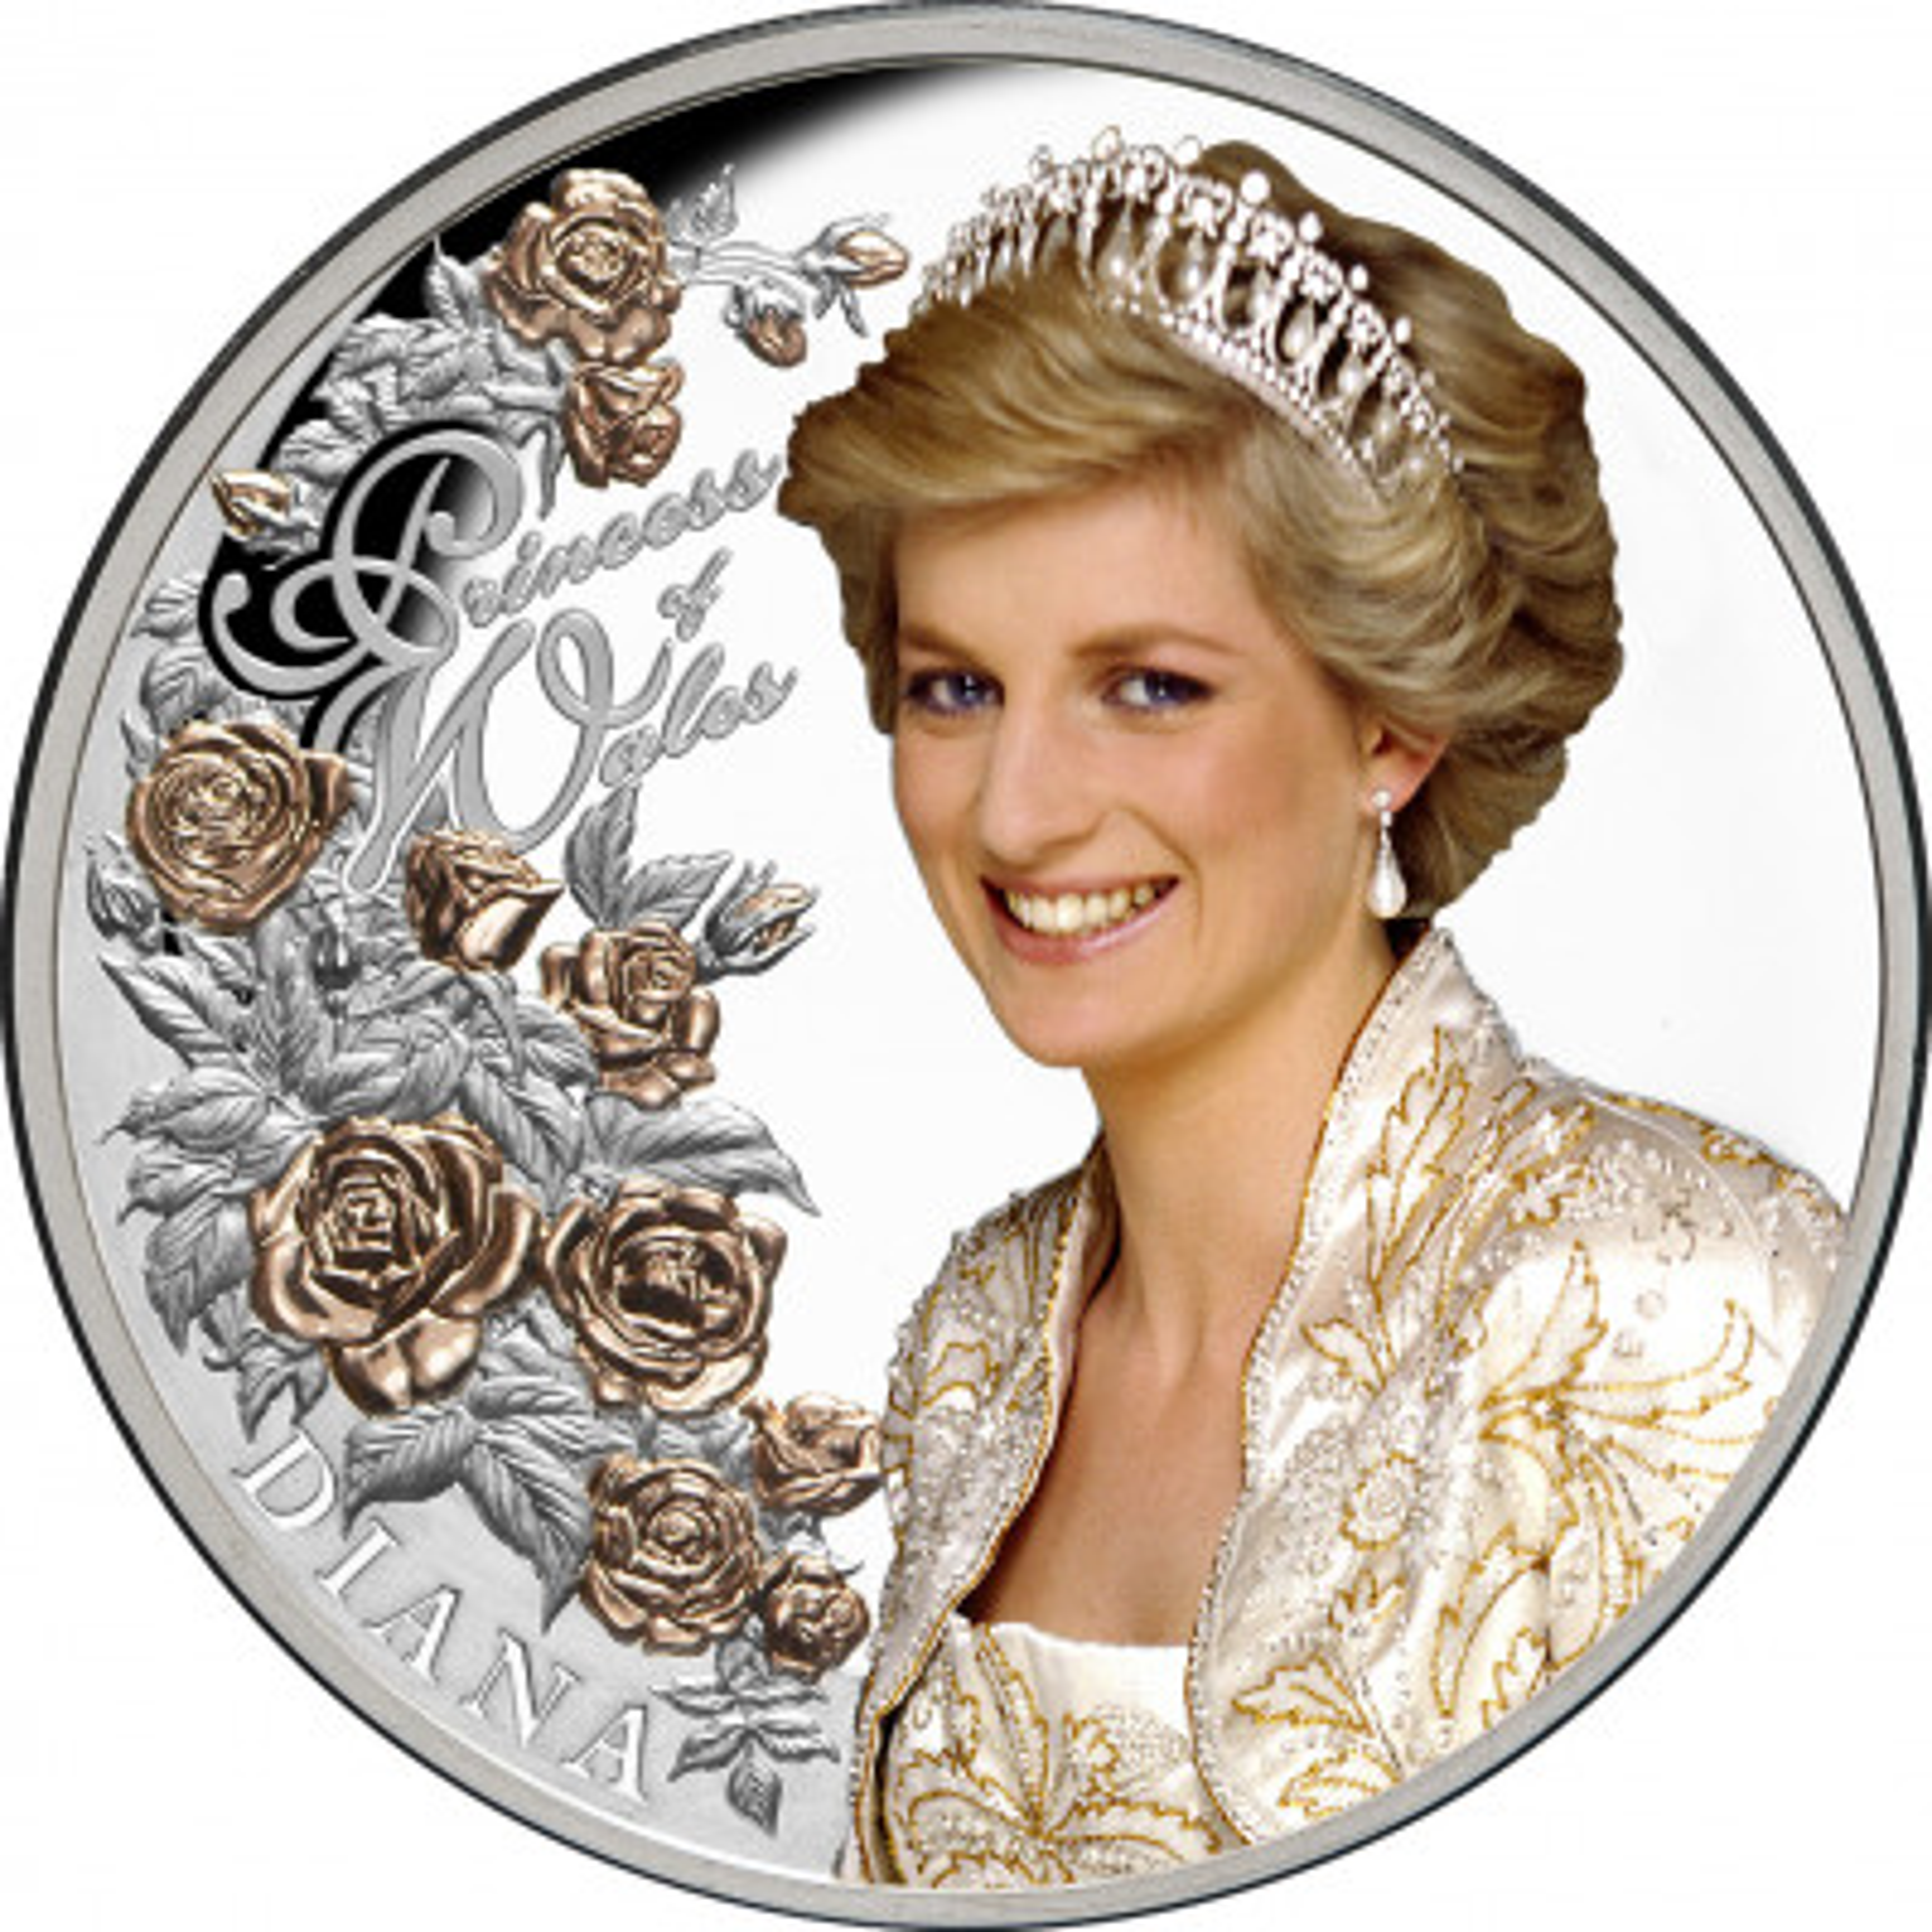 1 troy ounce zilveren munt Princess of Wales 2021 Proof